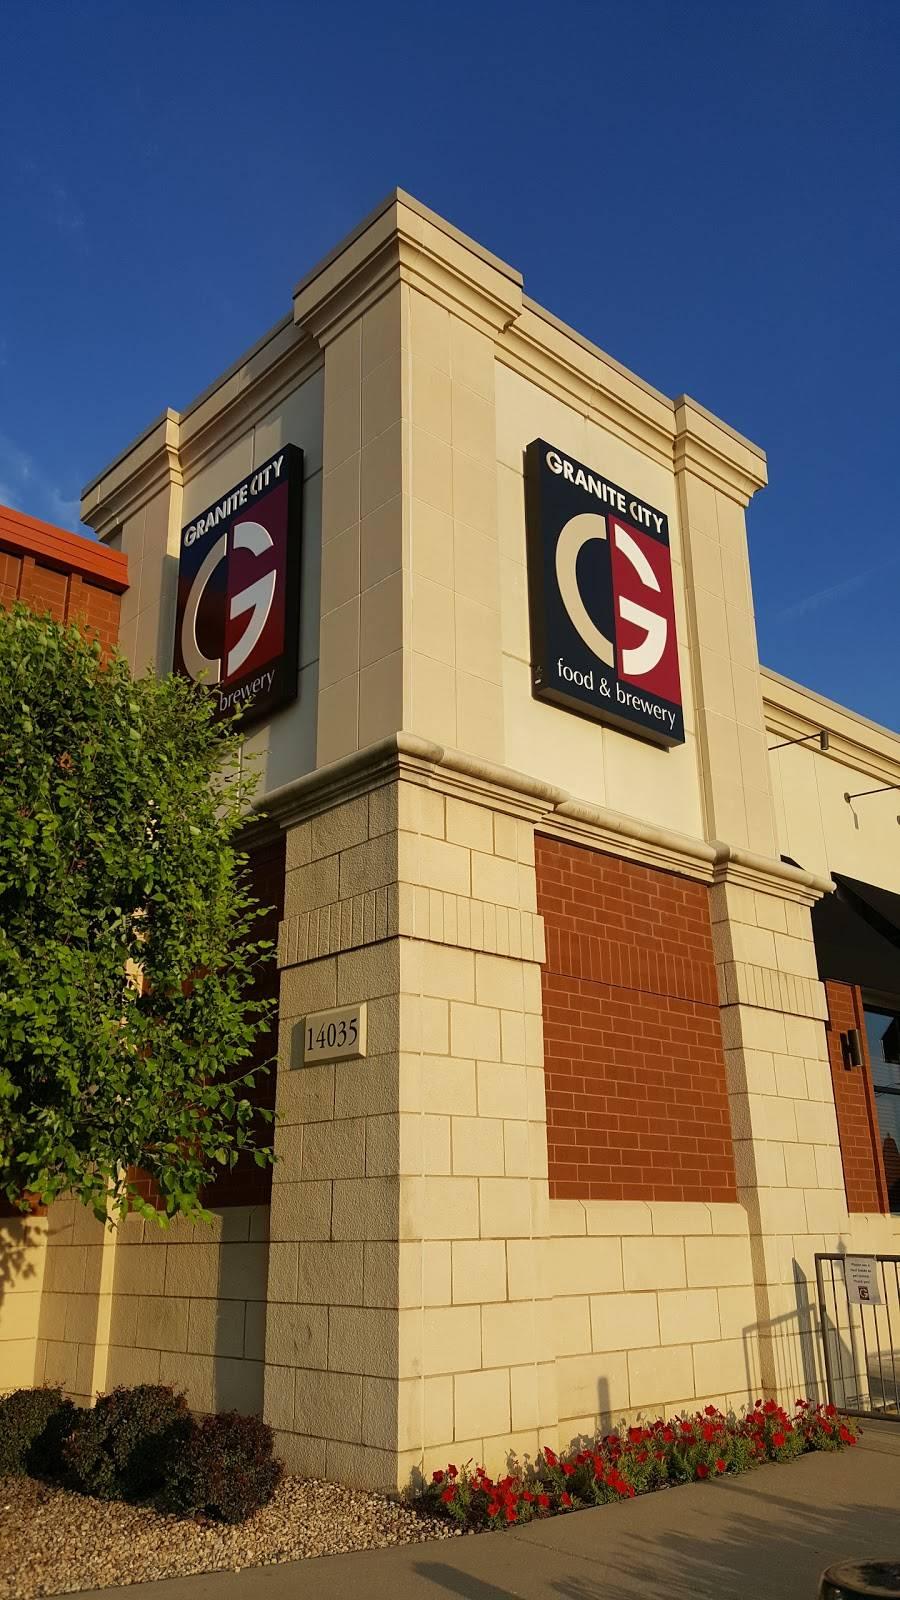 Granite City Food & Brewery | restaurant | 14035 South La Grange Road, Orland Park, IL 60462, USA | 7083641212 OR +1 708-364-1212